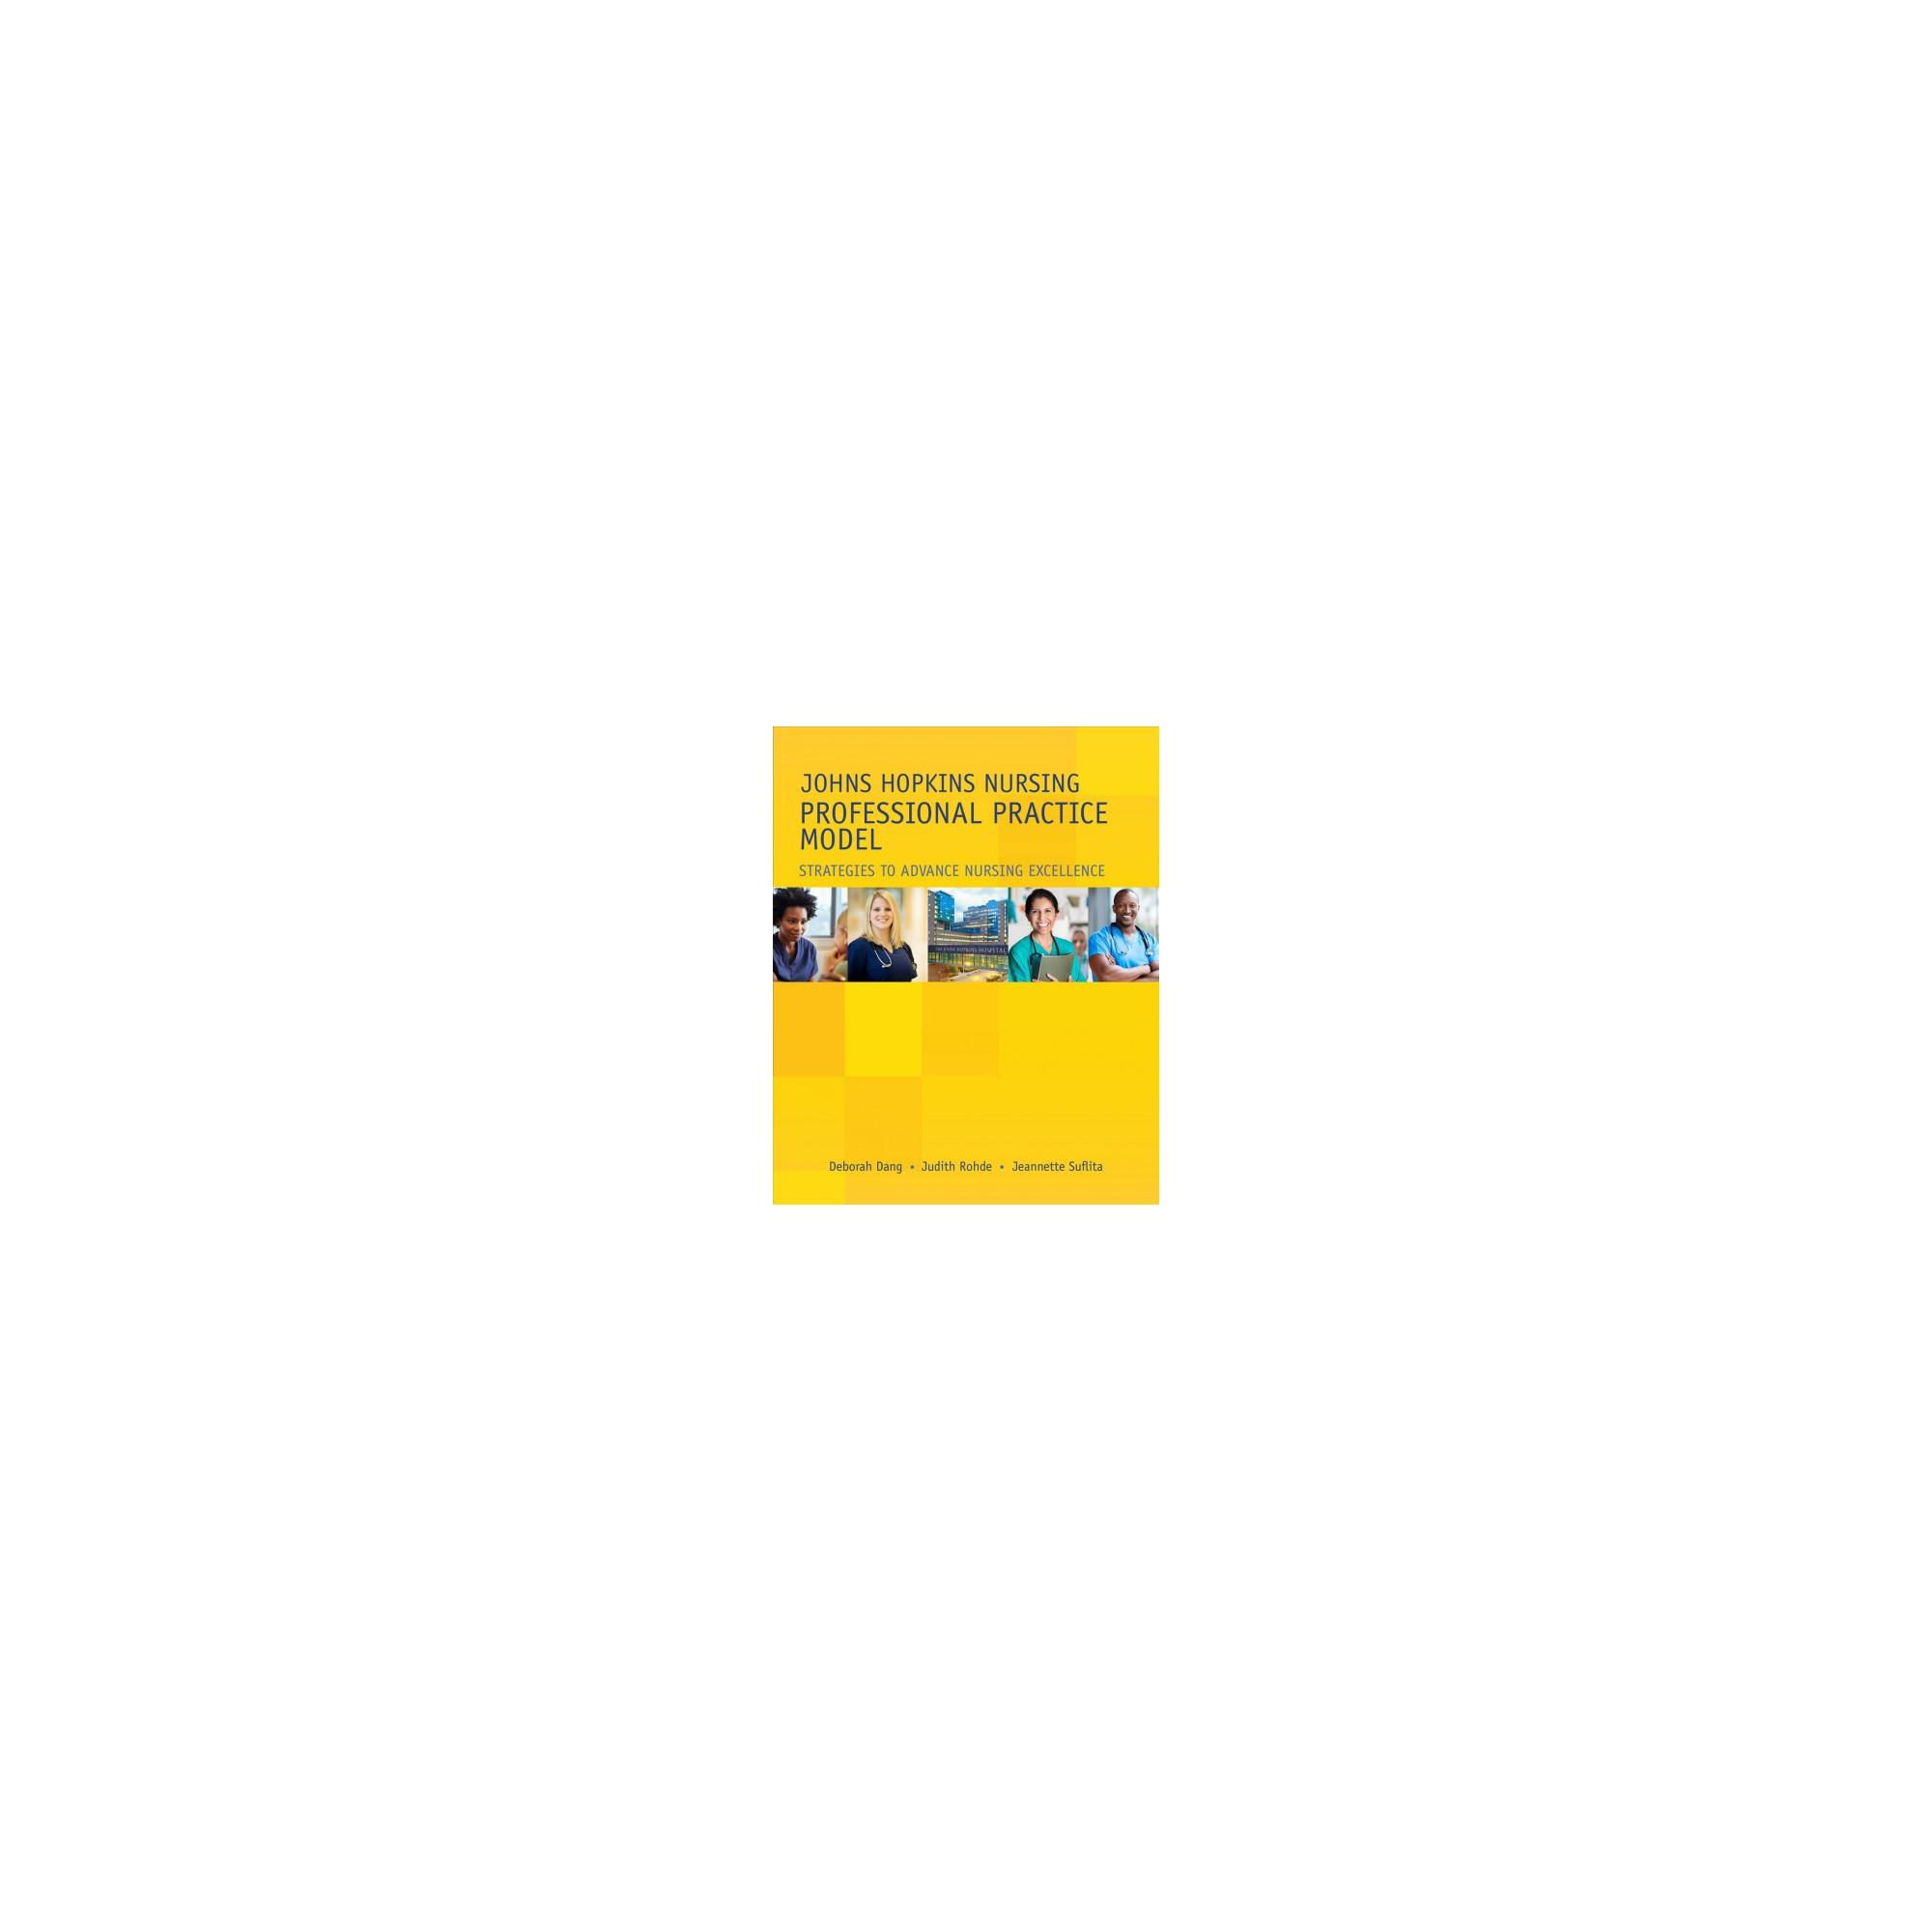 Johns Hopkins Nursing Professional Practice Model : Strategies to ... for Nursing Professional Practice Model  303mzq